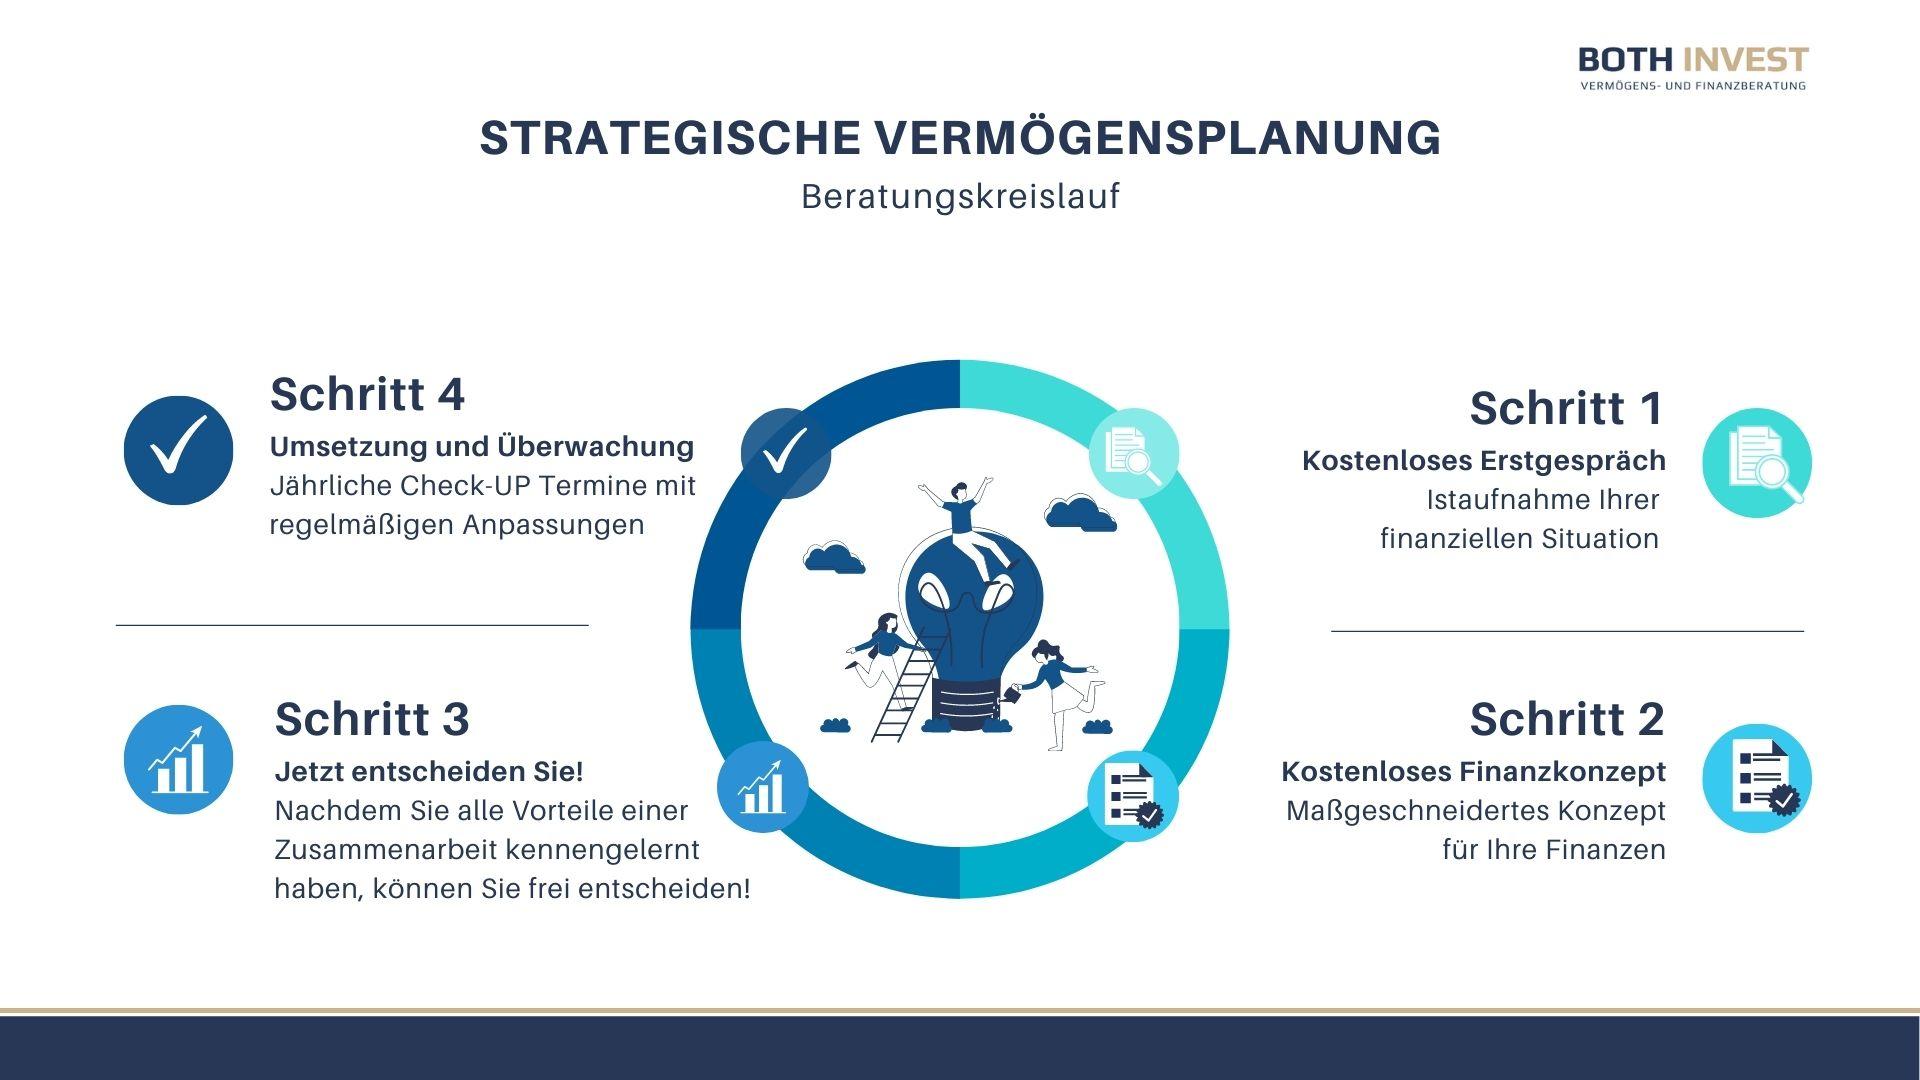 Beratungskreislauf, Finanzberatung Saarland